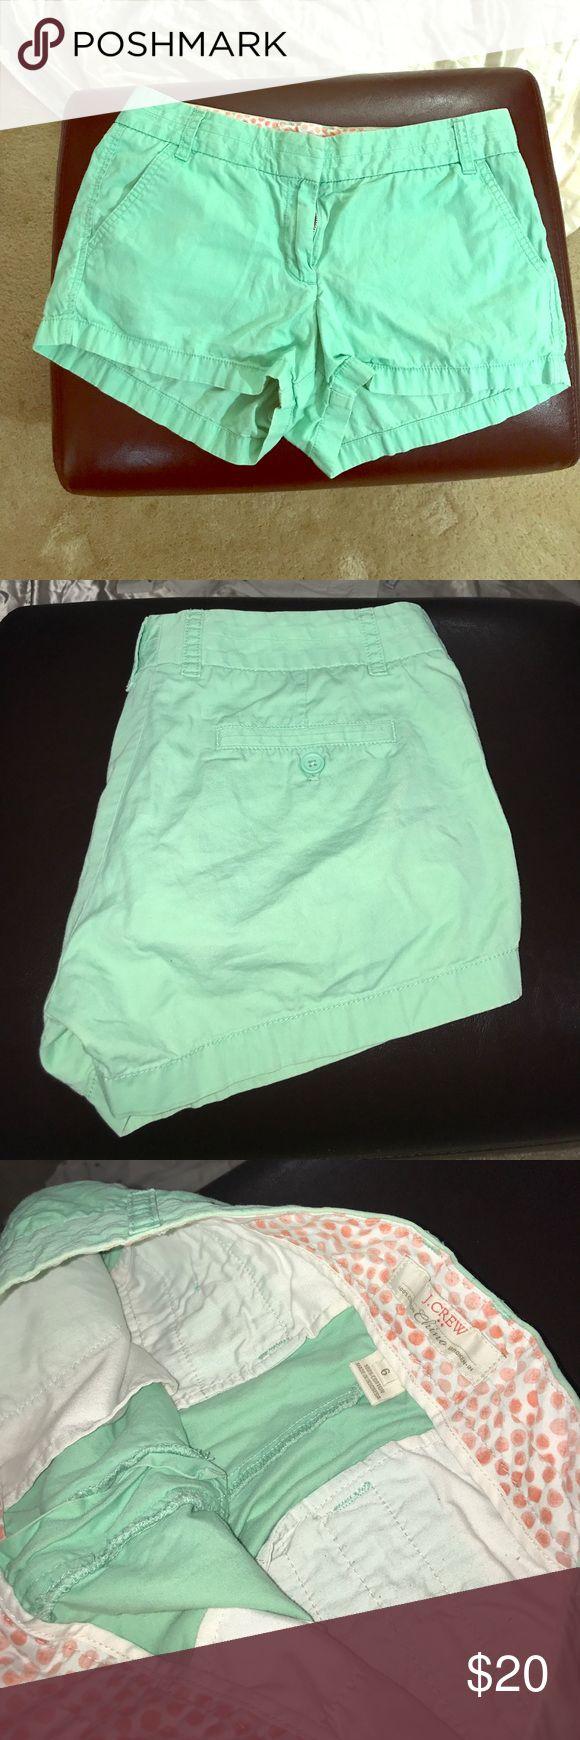 "J.CREW ""Chino Broken In"" shorts. Mint green, size6 Mint green shorts from J. CREW. Style: ""Chino Broken In"". Size 6. J. Crew Shorts"